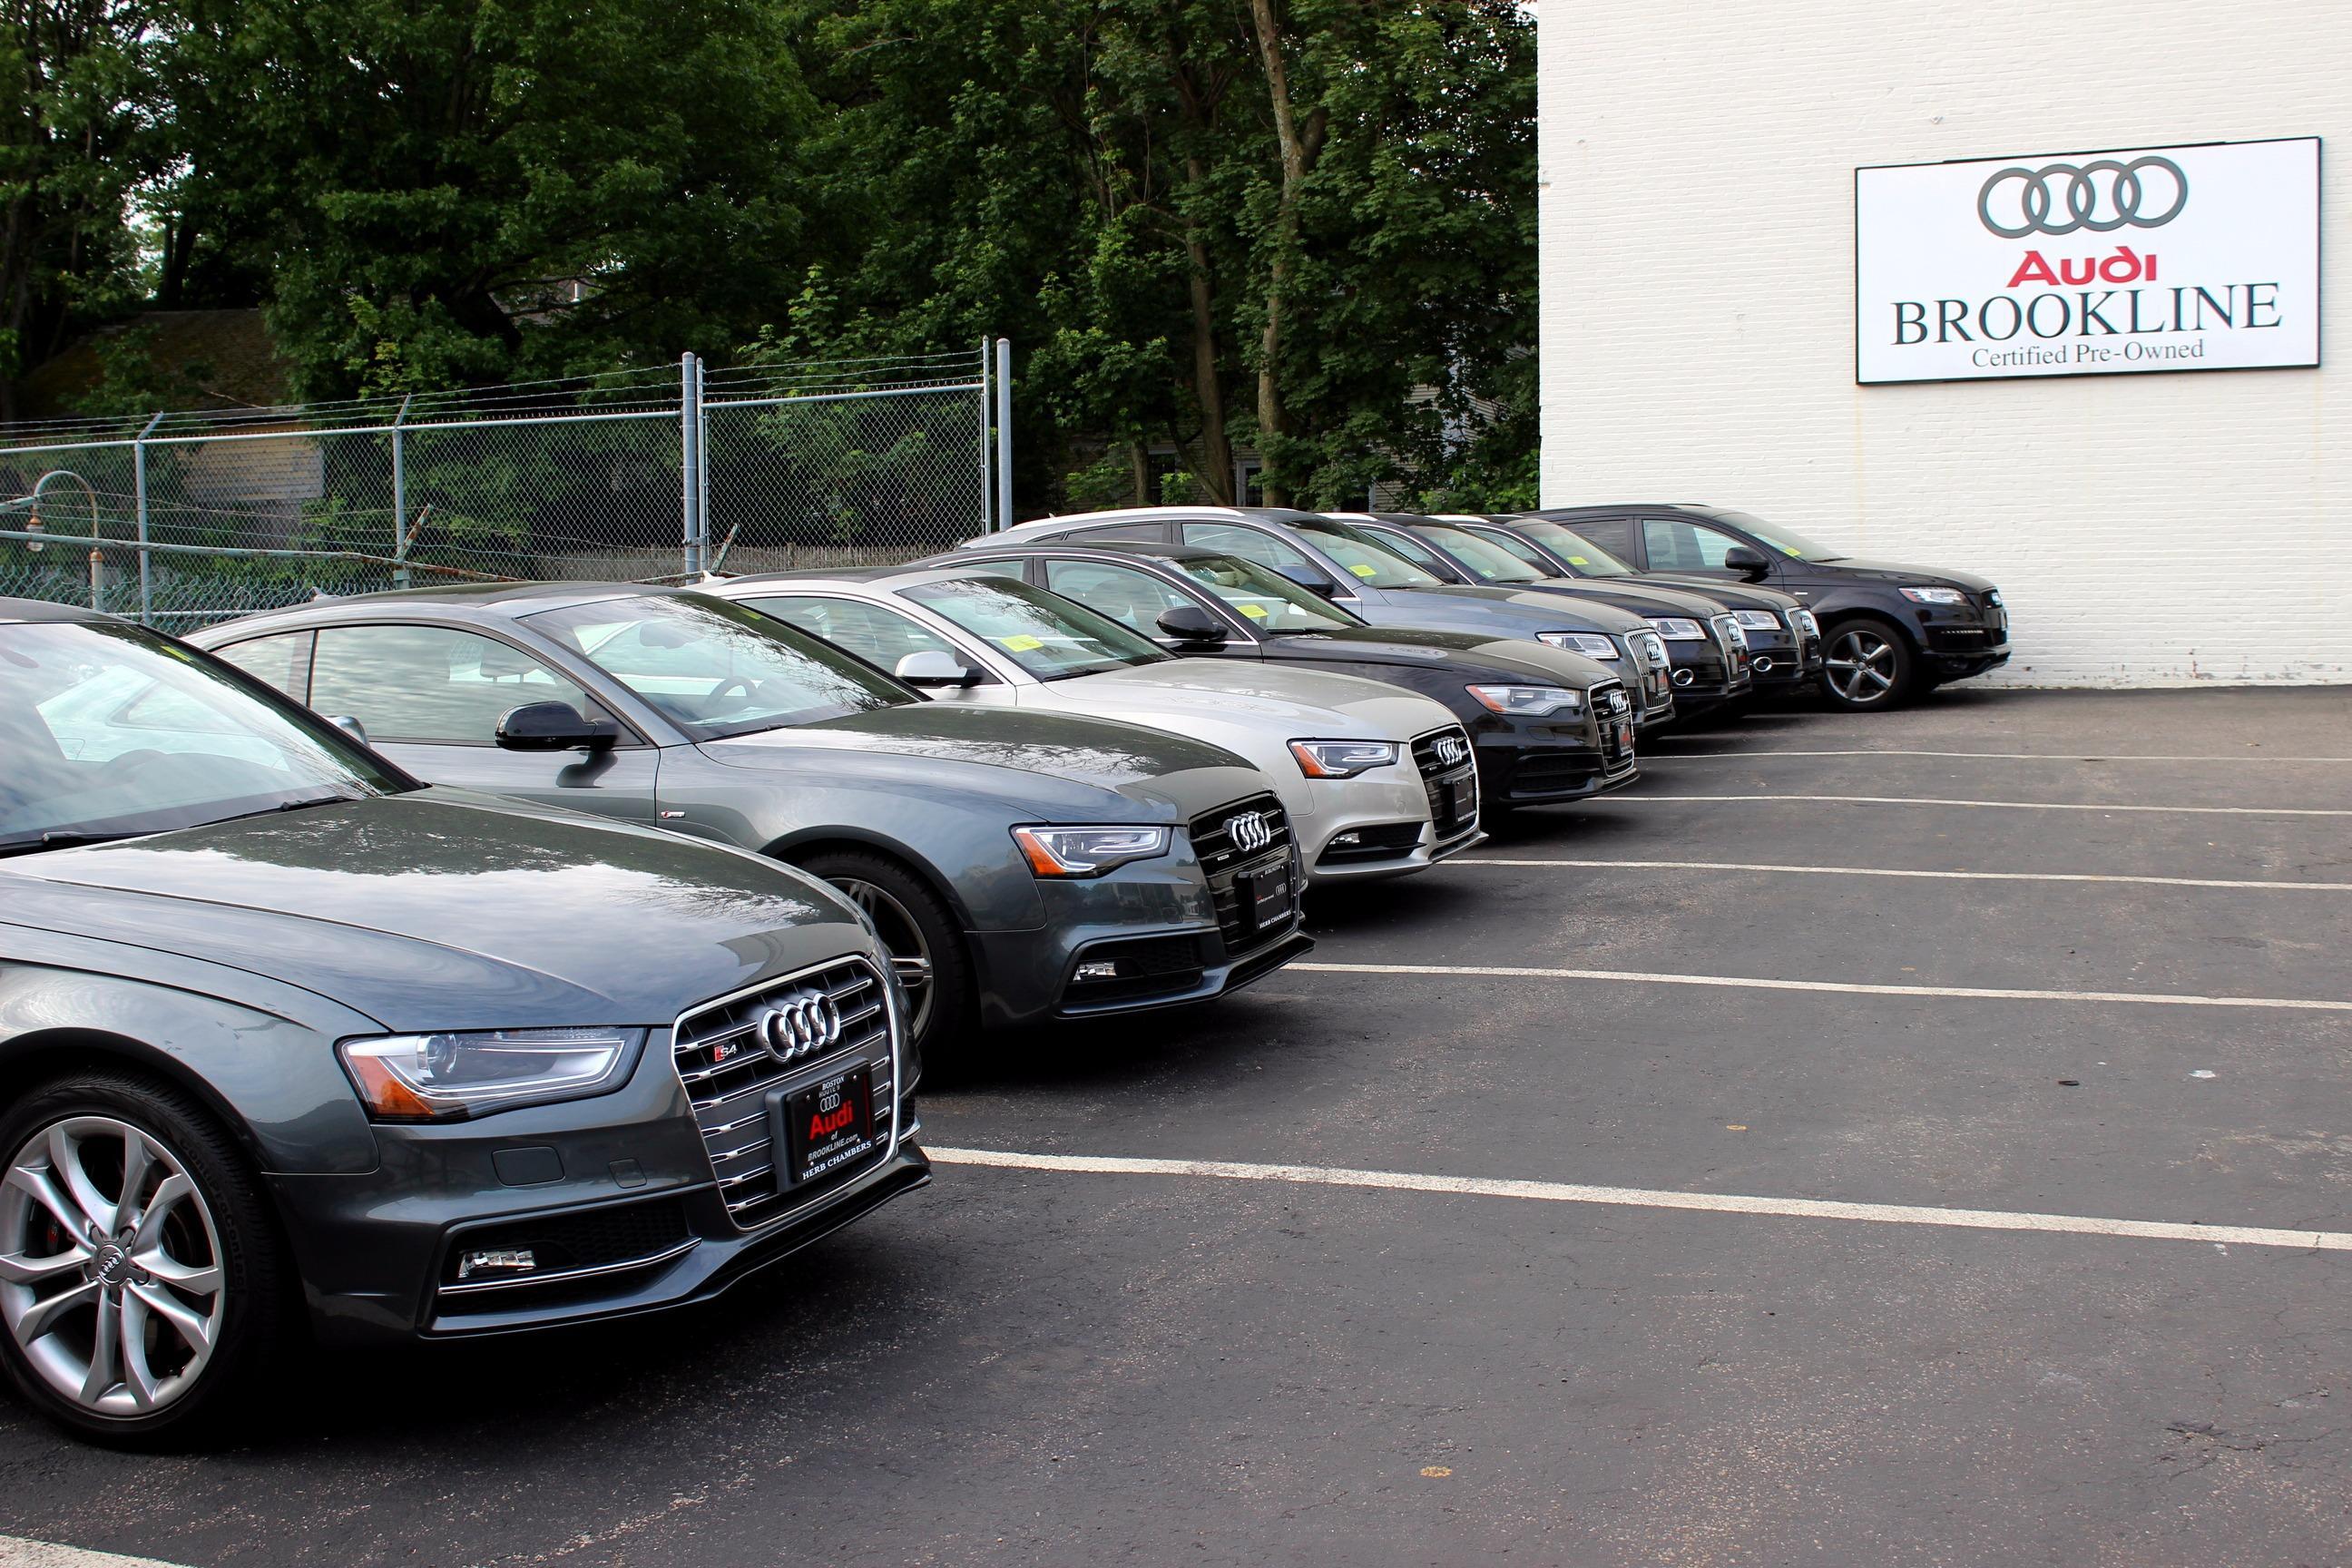 Audi Brookline Boylston St Brookline MA Auto Dealers MapQuest - Audi brookline